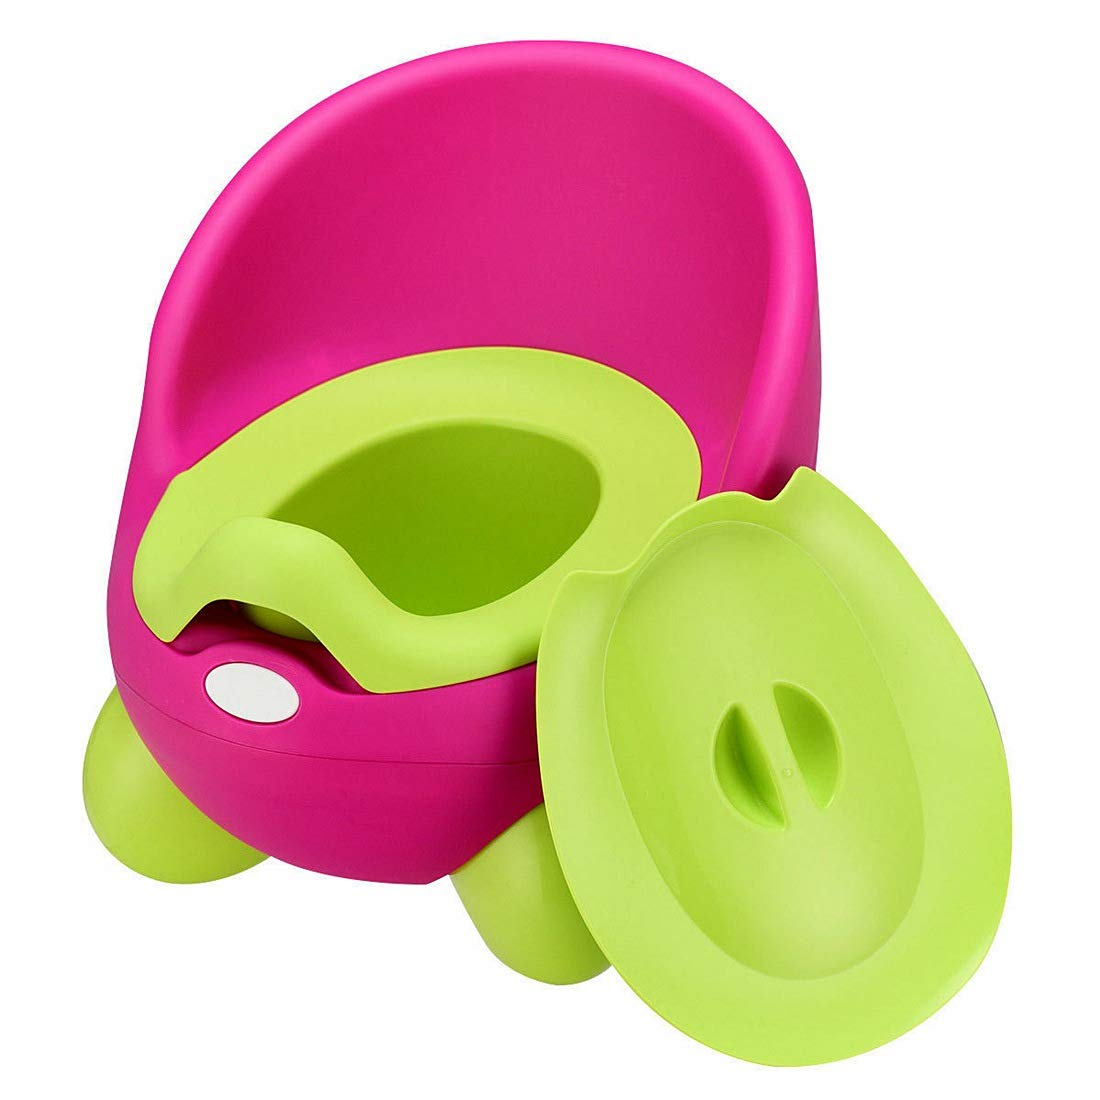 Lucidz Toilet Chair Training Toddlers Potty Splash Guard Detachable Seat Boys Girls Travel Potties Pink & Green